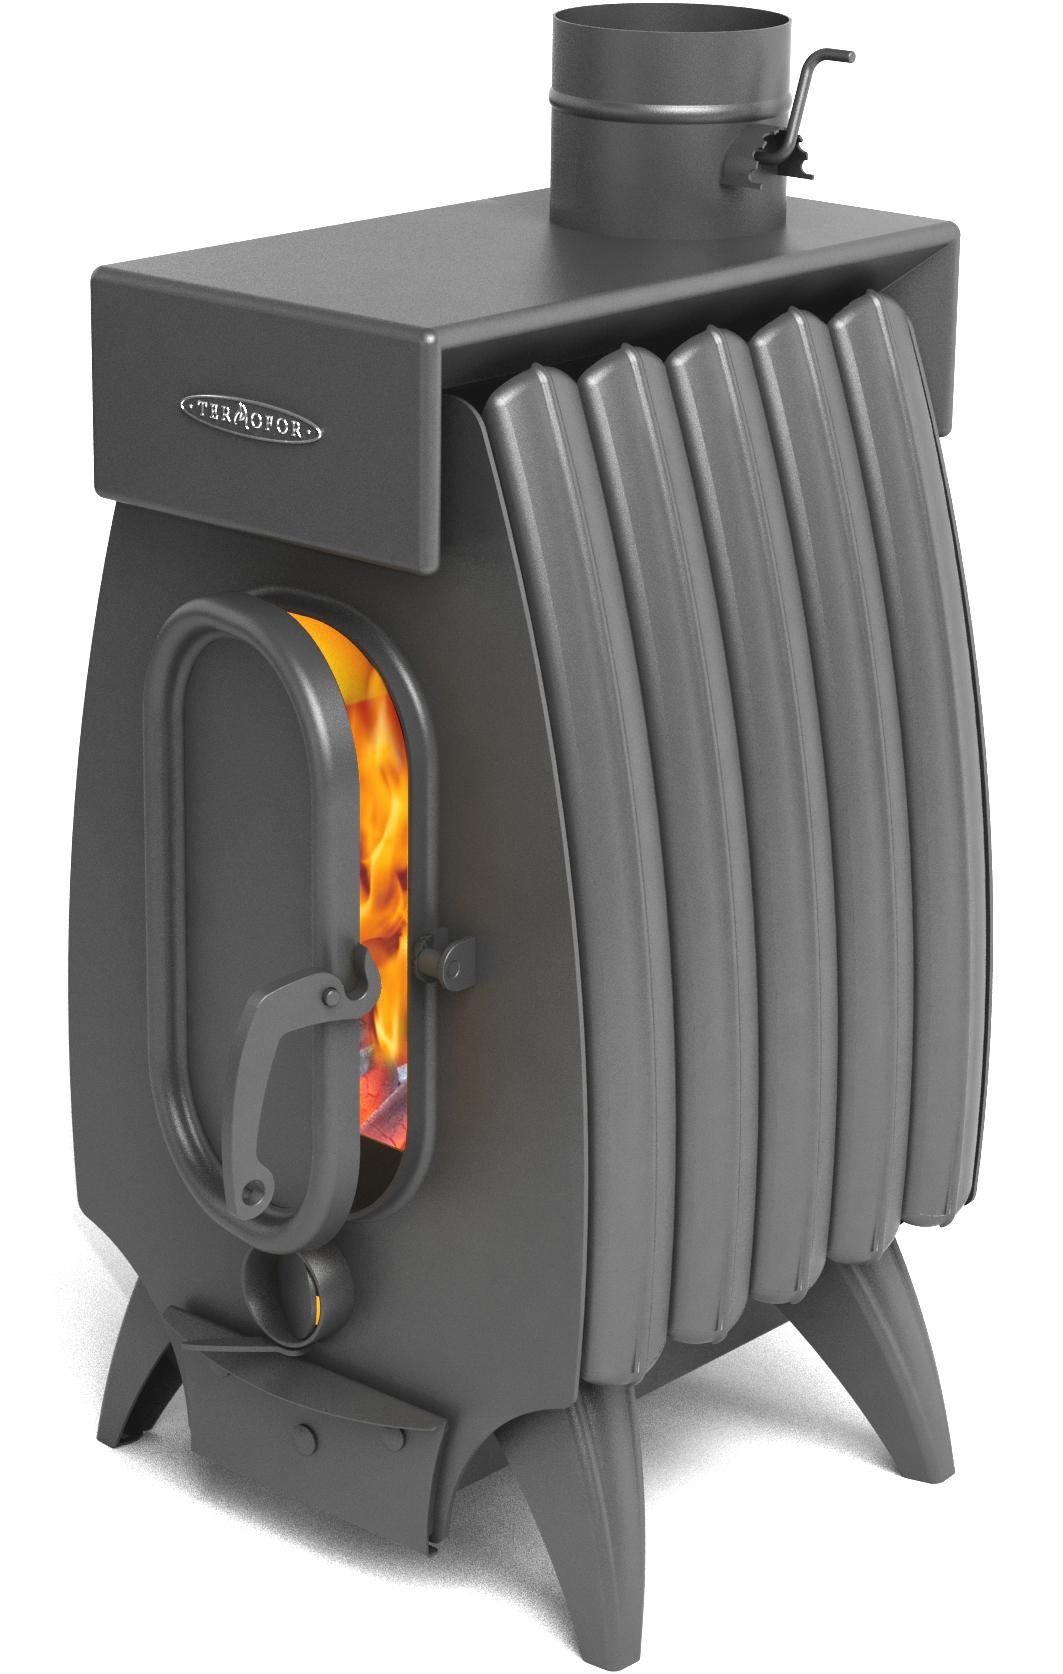 Термофор Огонь- батарея 5 лайт, Vmax 100 м3